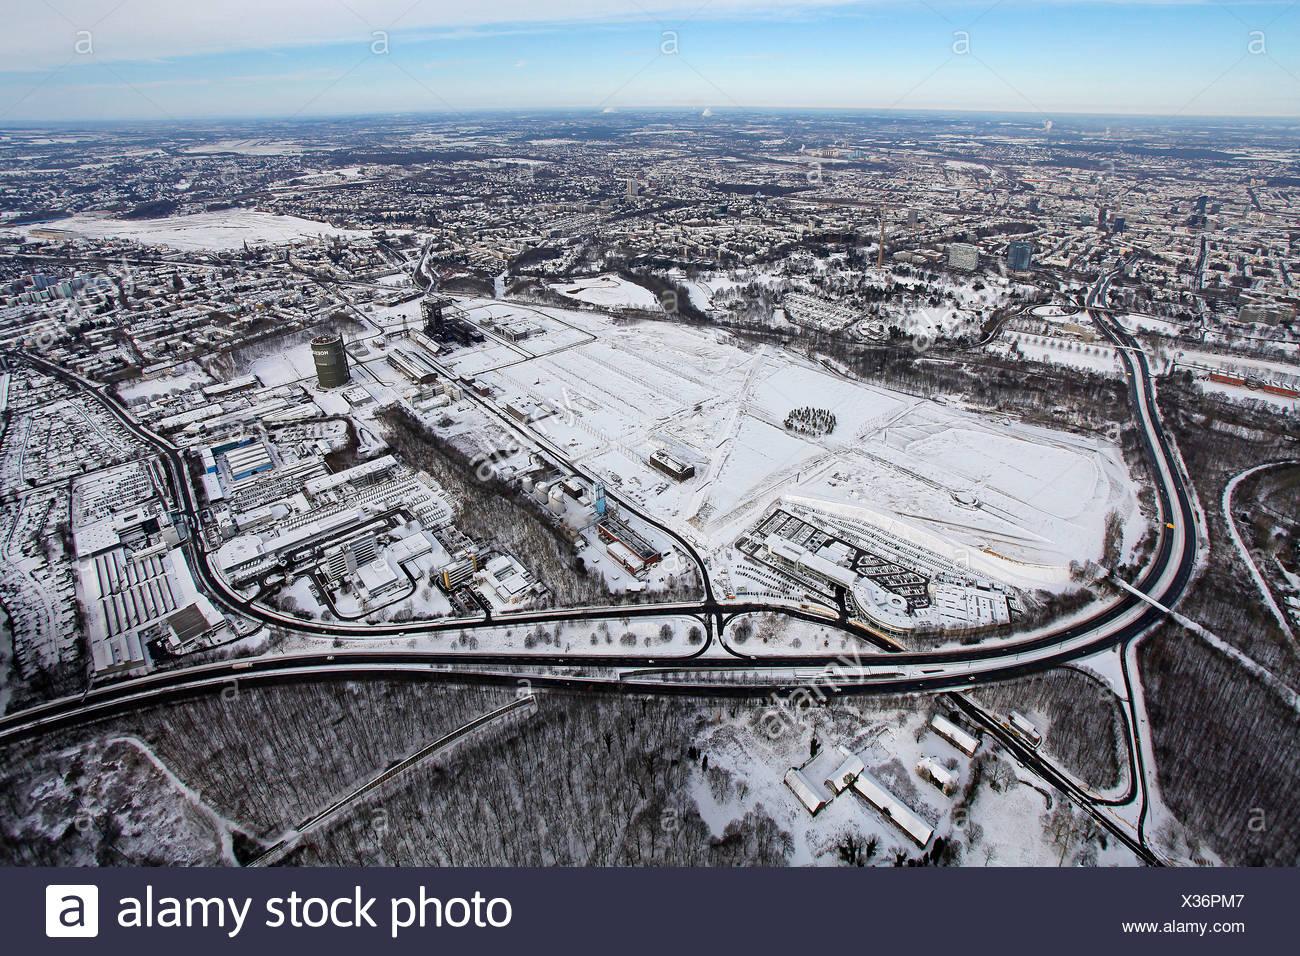 Aerial view, industrial wasteland, LEG, industrial park, industrial area Phoenix West, Dortmund, Ruhrgebiet region - Stock Image